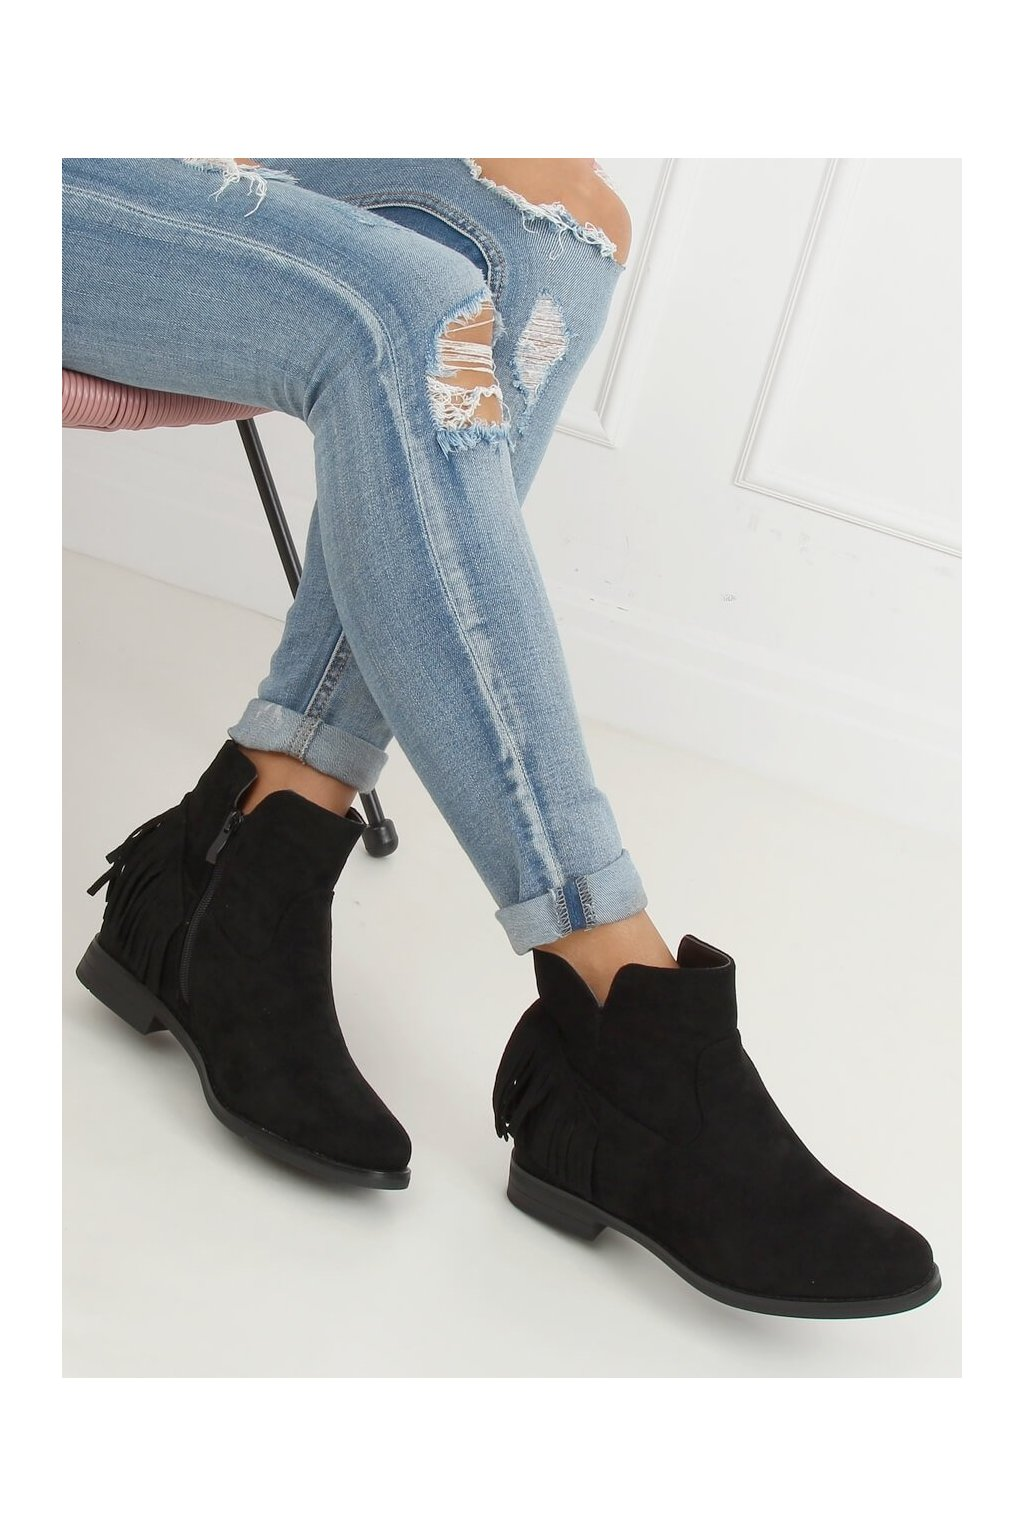 Dámske členkové topánky čierne na platforme 1515